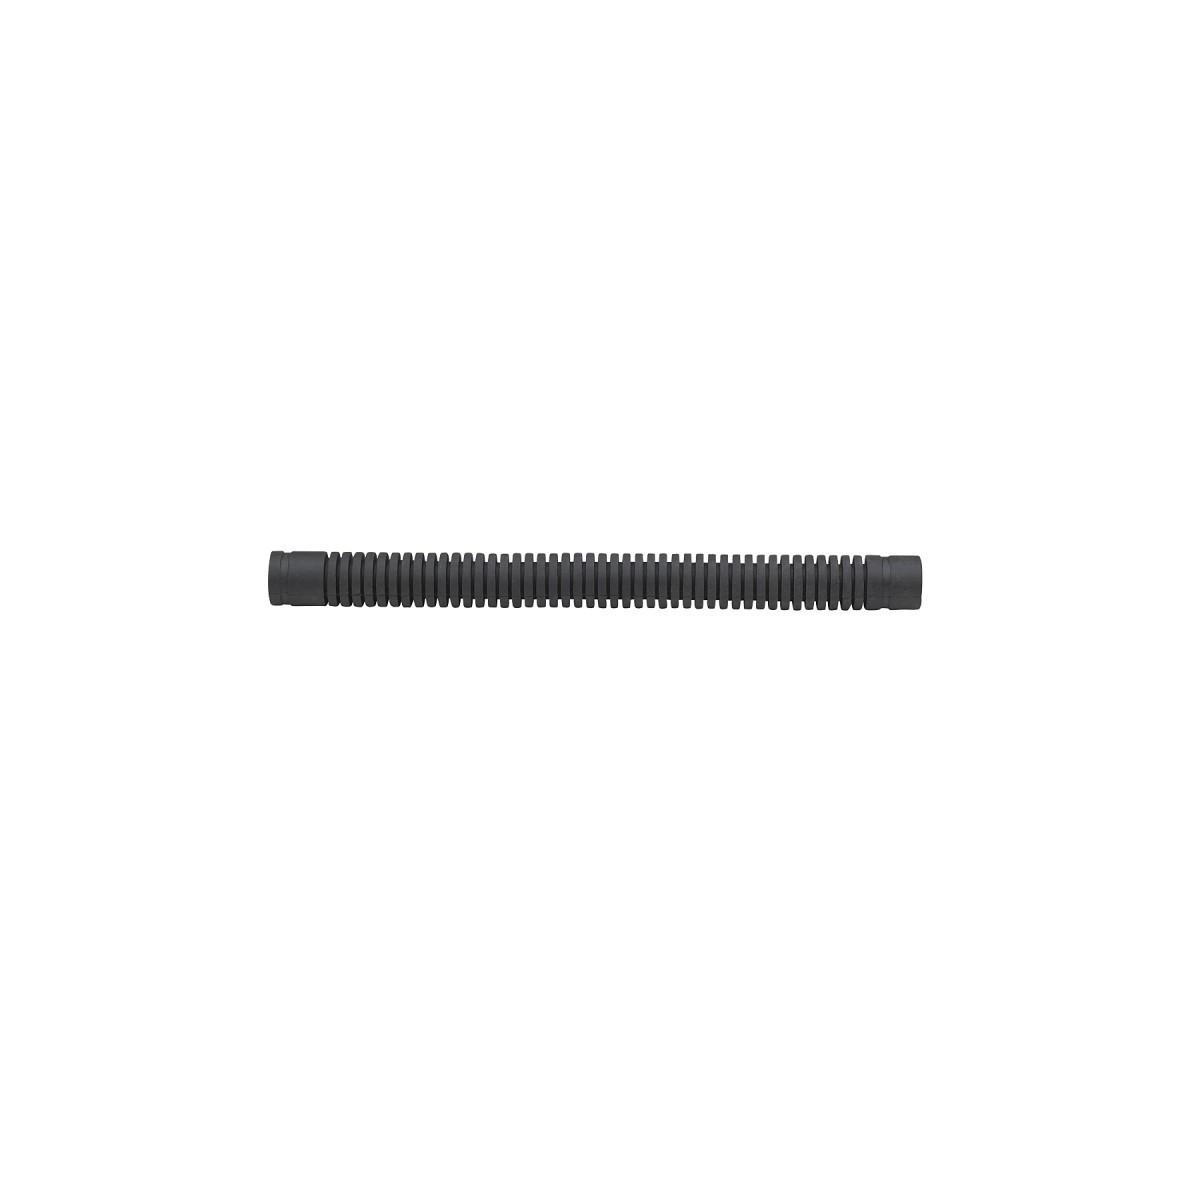 "Hollis Corrugated Adapter Hose 16"", Air 2 (1"" X 1/2"" Hose)"